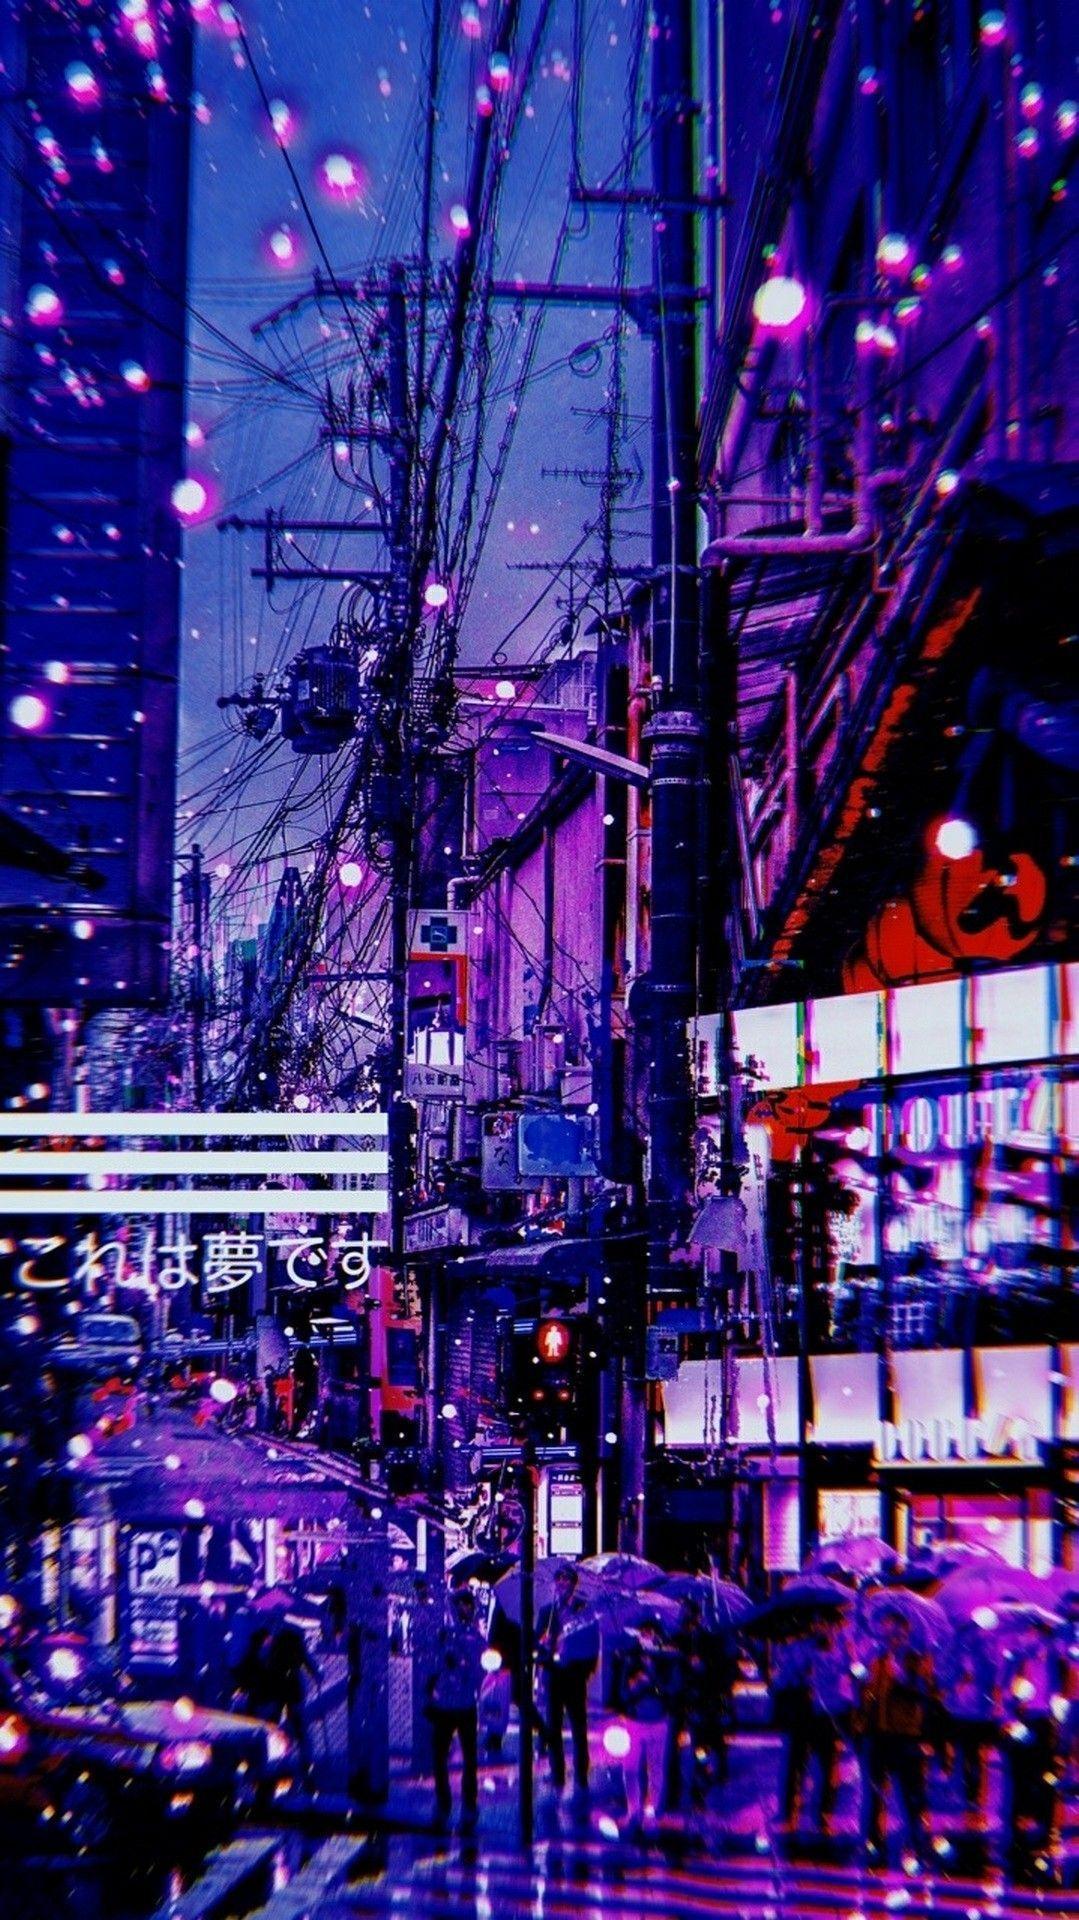 Cyberpunk Aesthetic Wallpapers Top Free Cyberpunk Aesthetic Backgrounds Wallpaperaccess